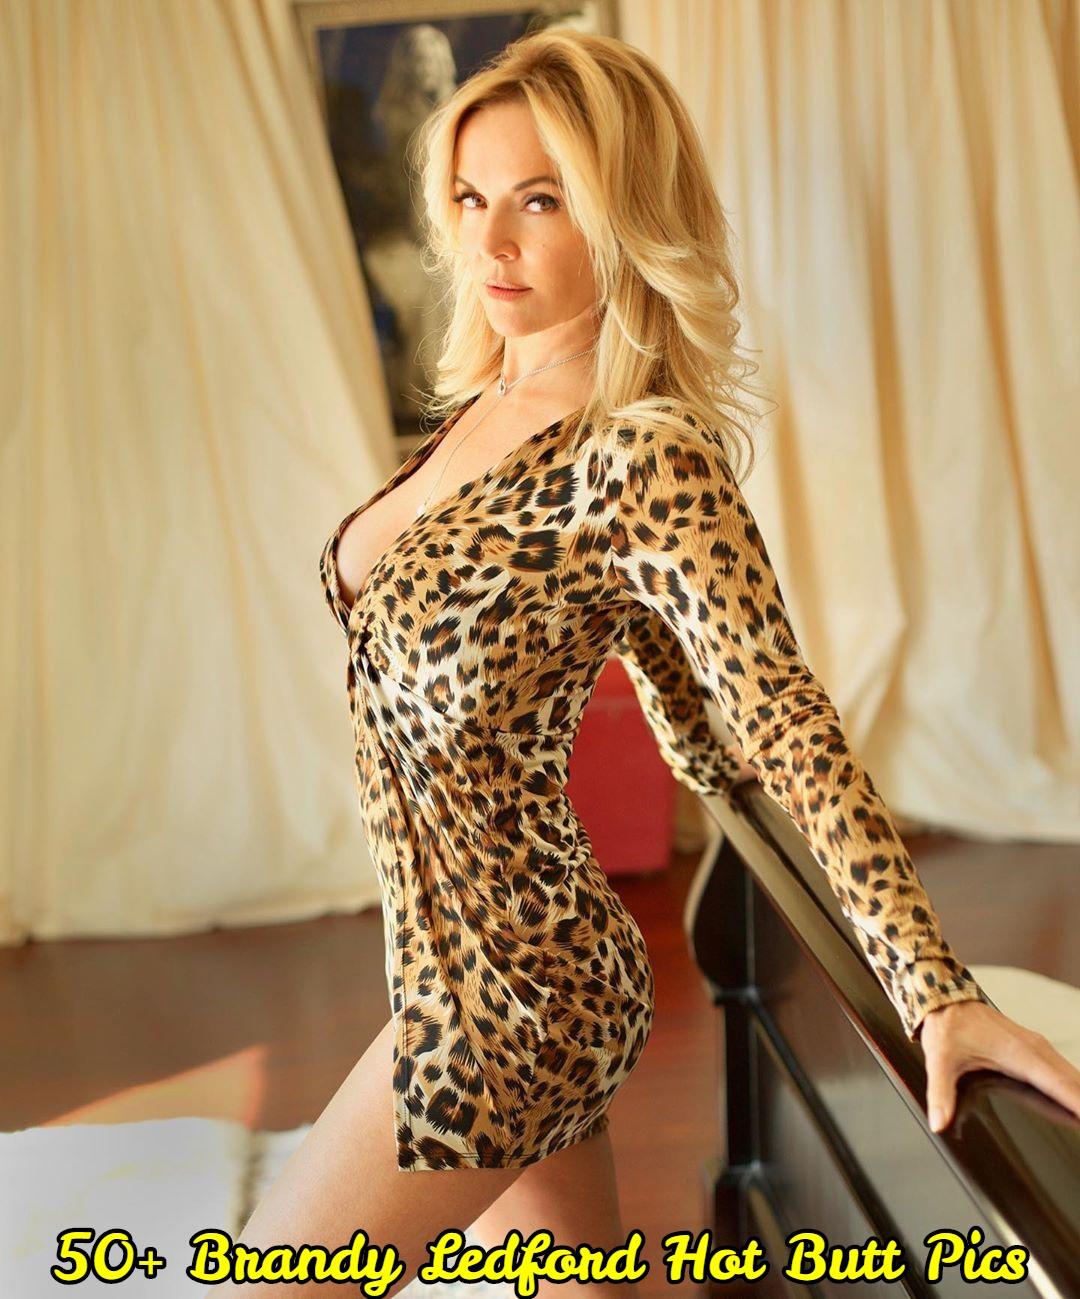 Brandy Ledford Hot Butt Pics